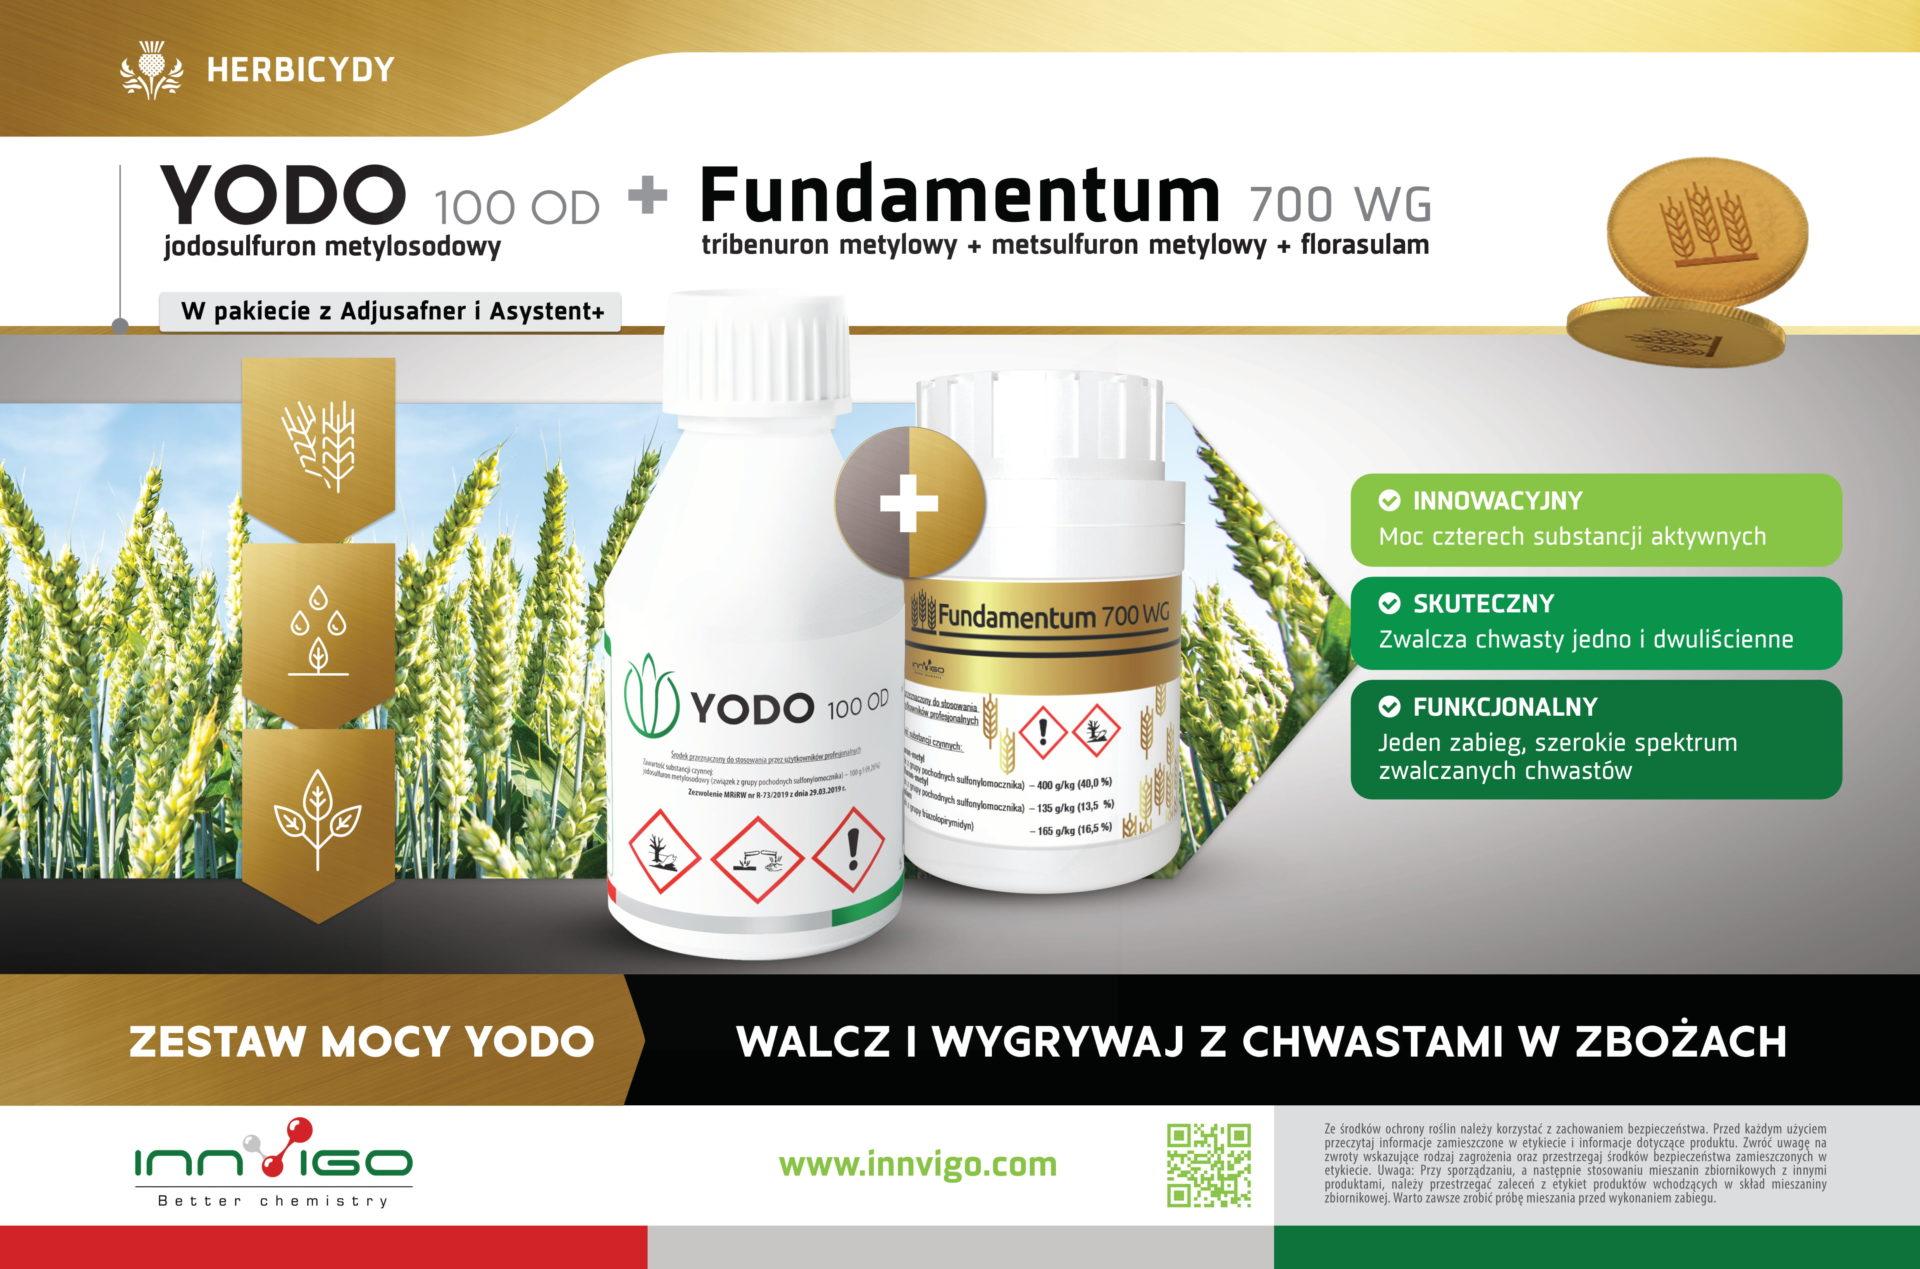 Zestaw Mocy Yodo + Fundamentum Herbicydy